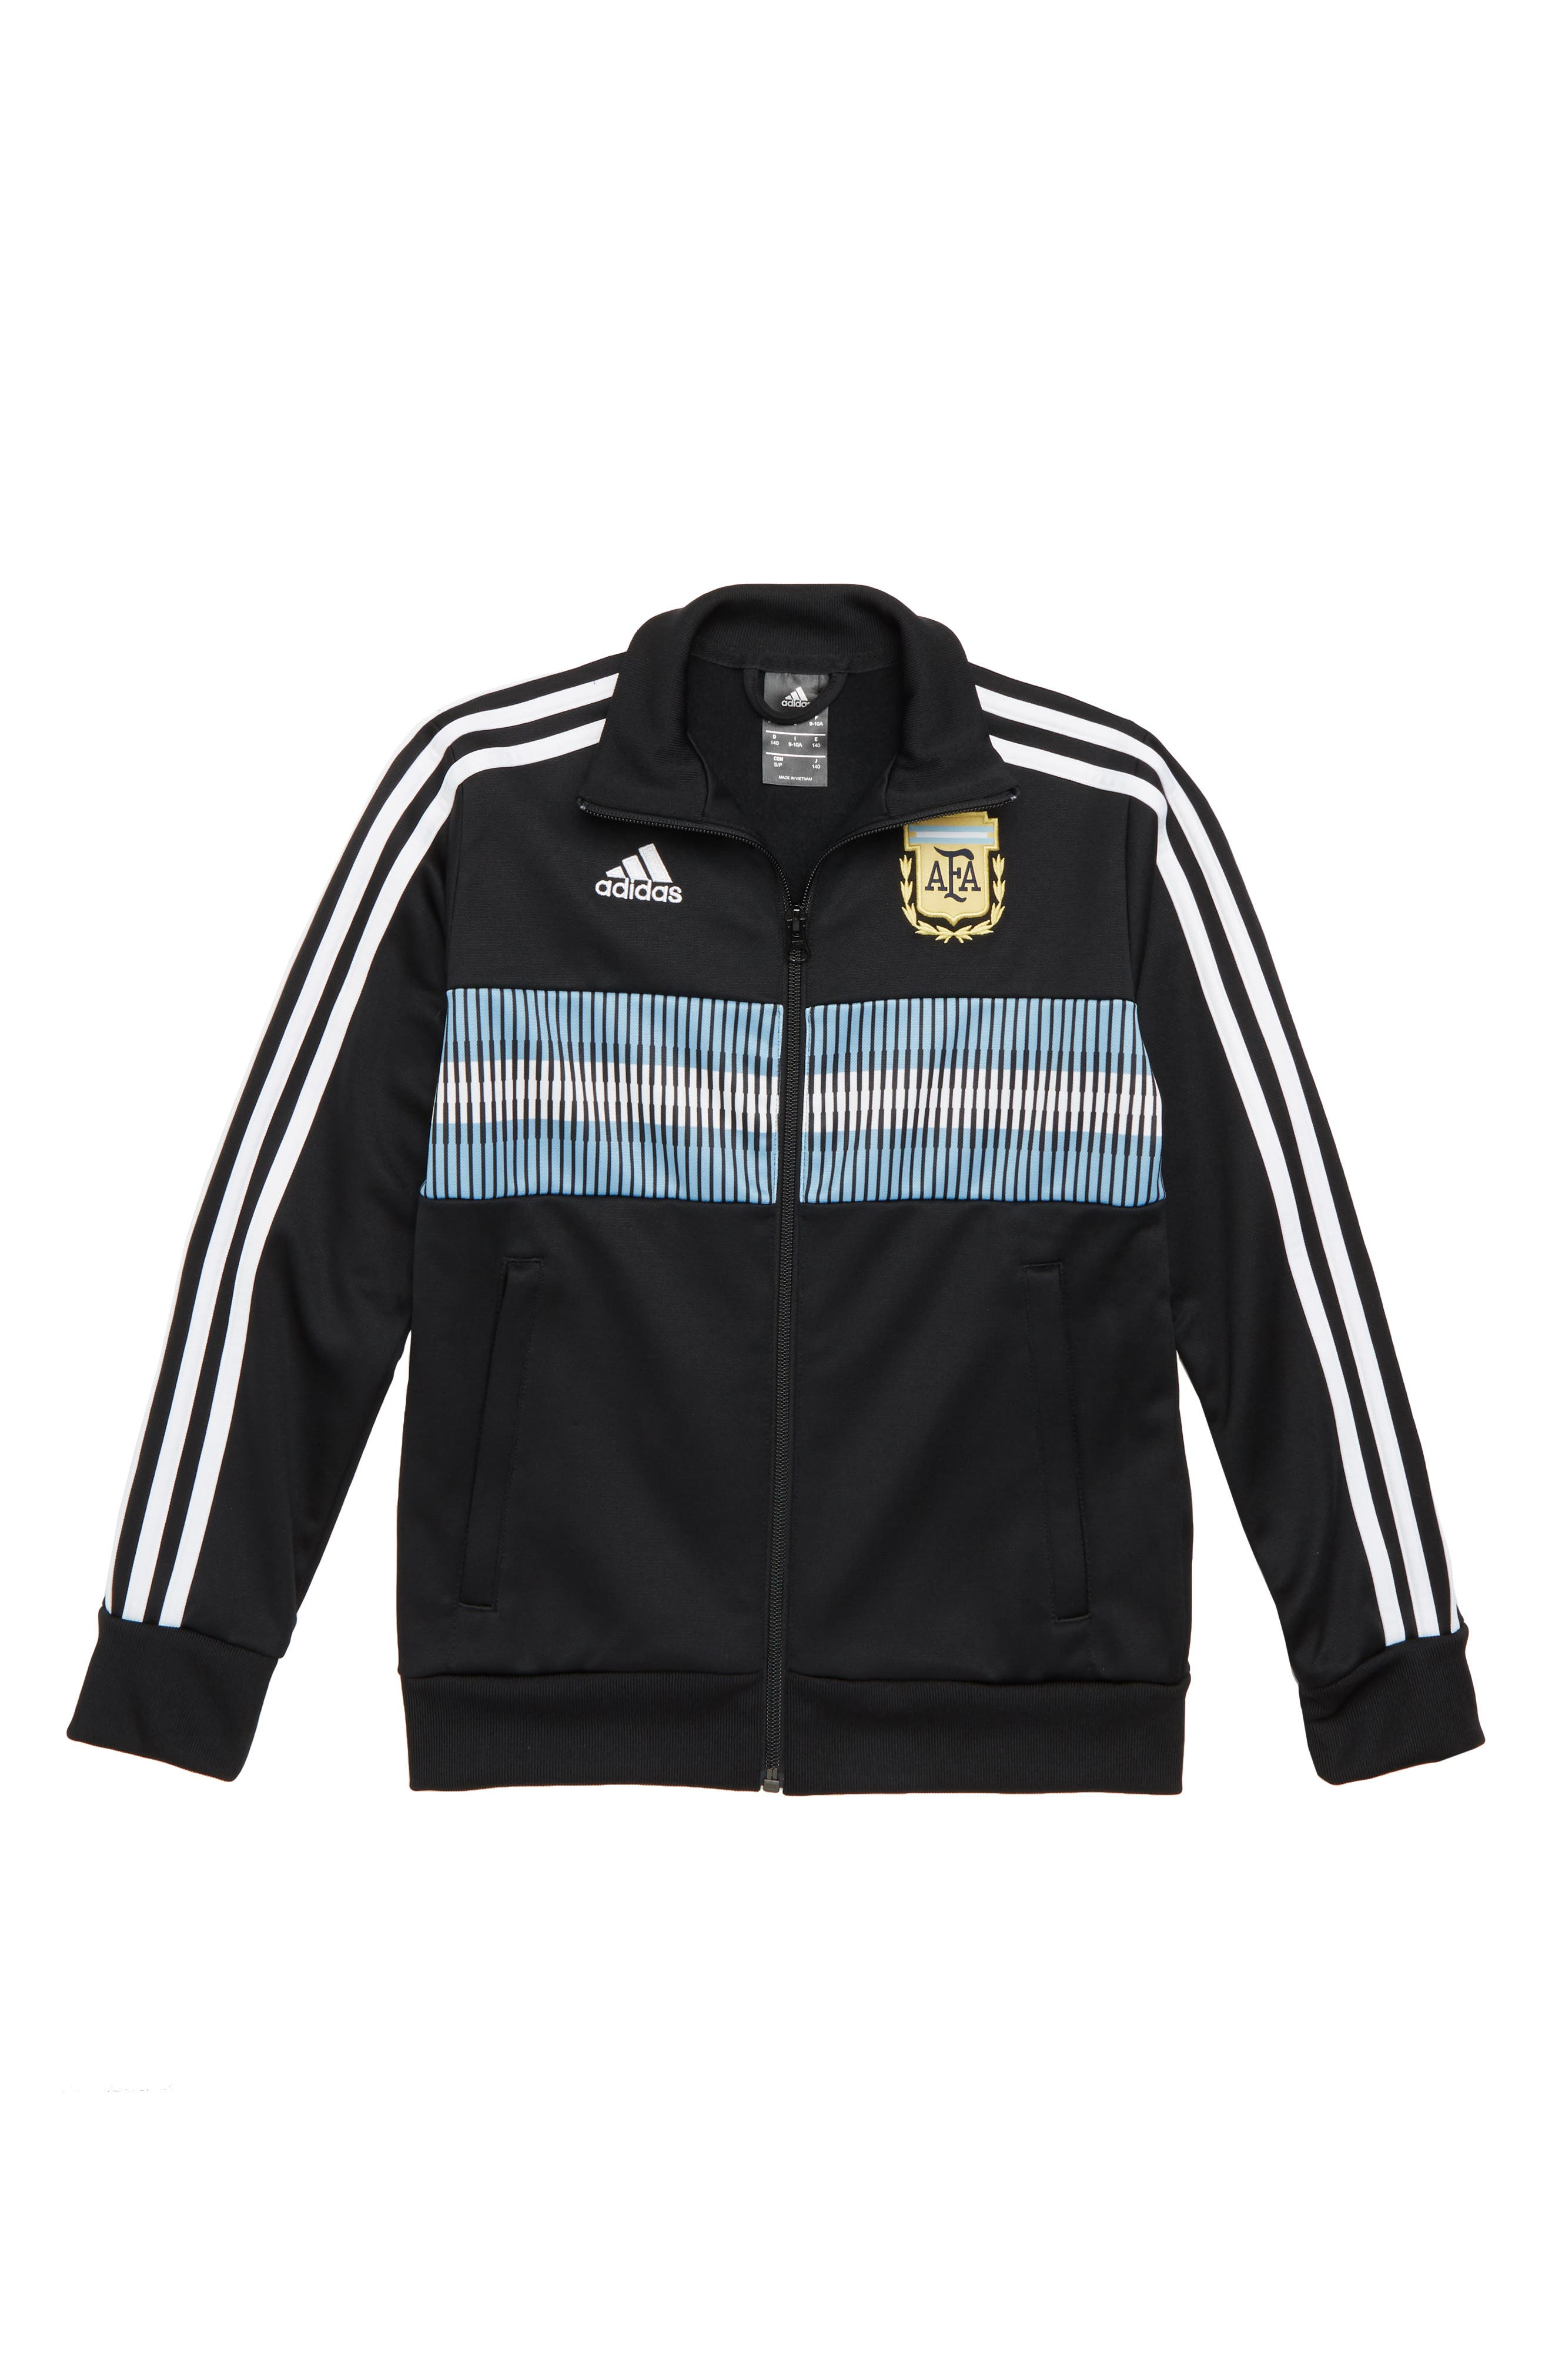 Bambini: Adidas Vestiario T Shirts, Jeans, Pantaloni E Felpe Nordstrom